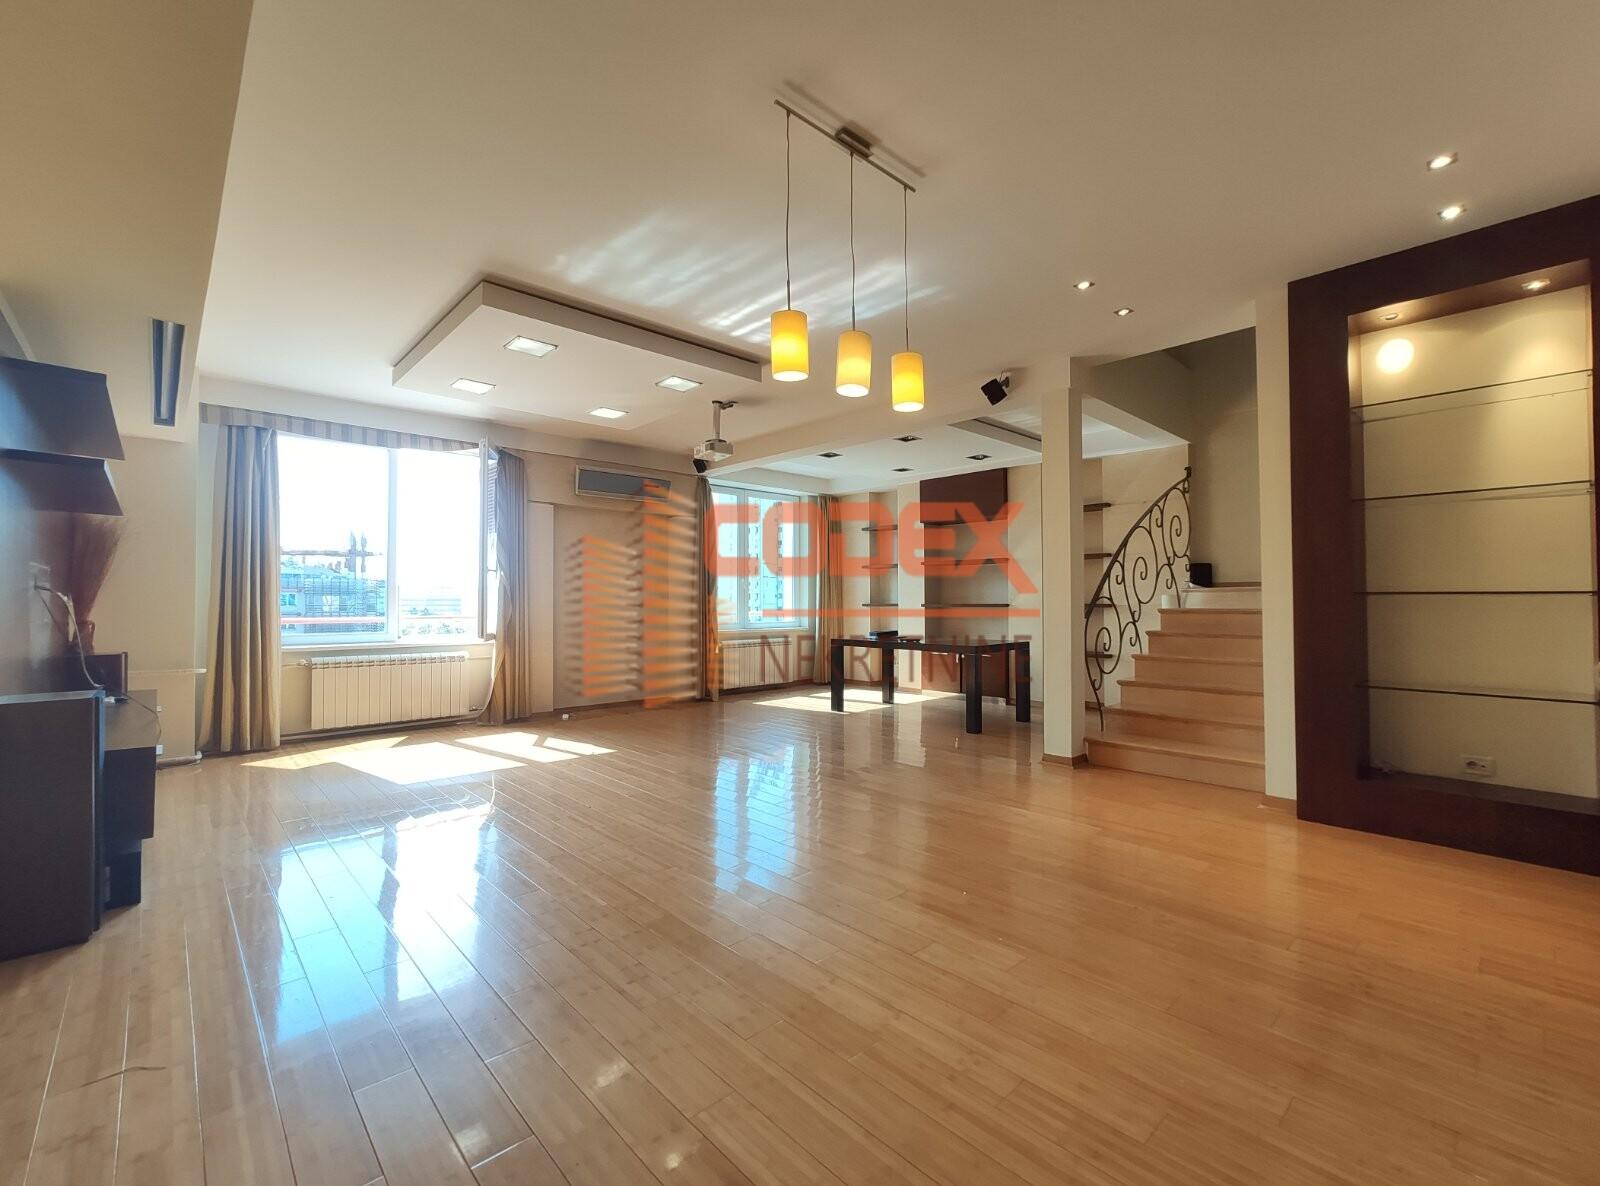 YUBC, luksuzan duplex u novogradnji, 5.0